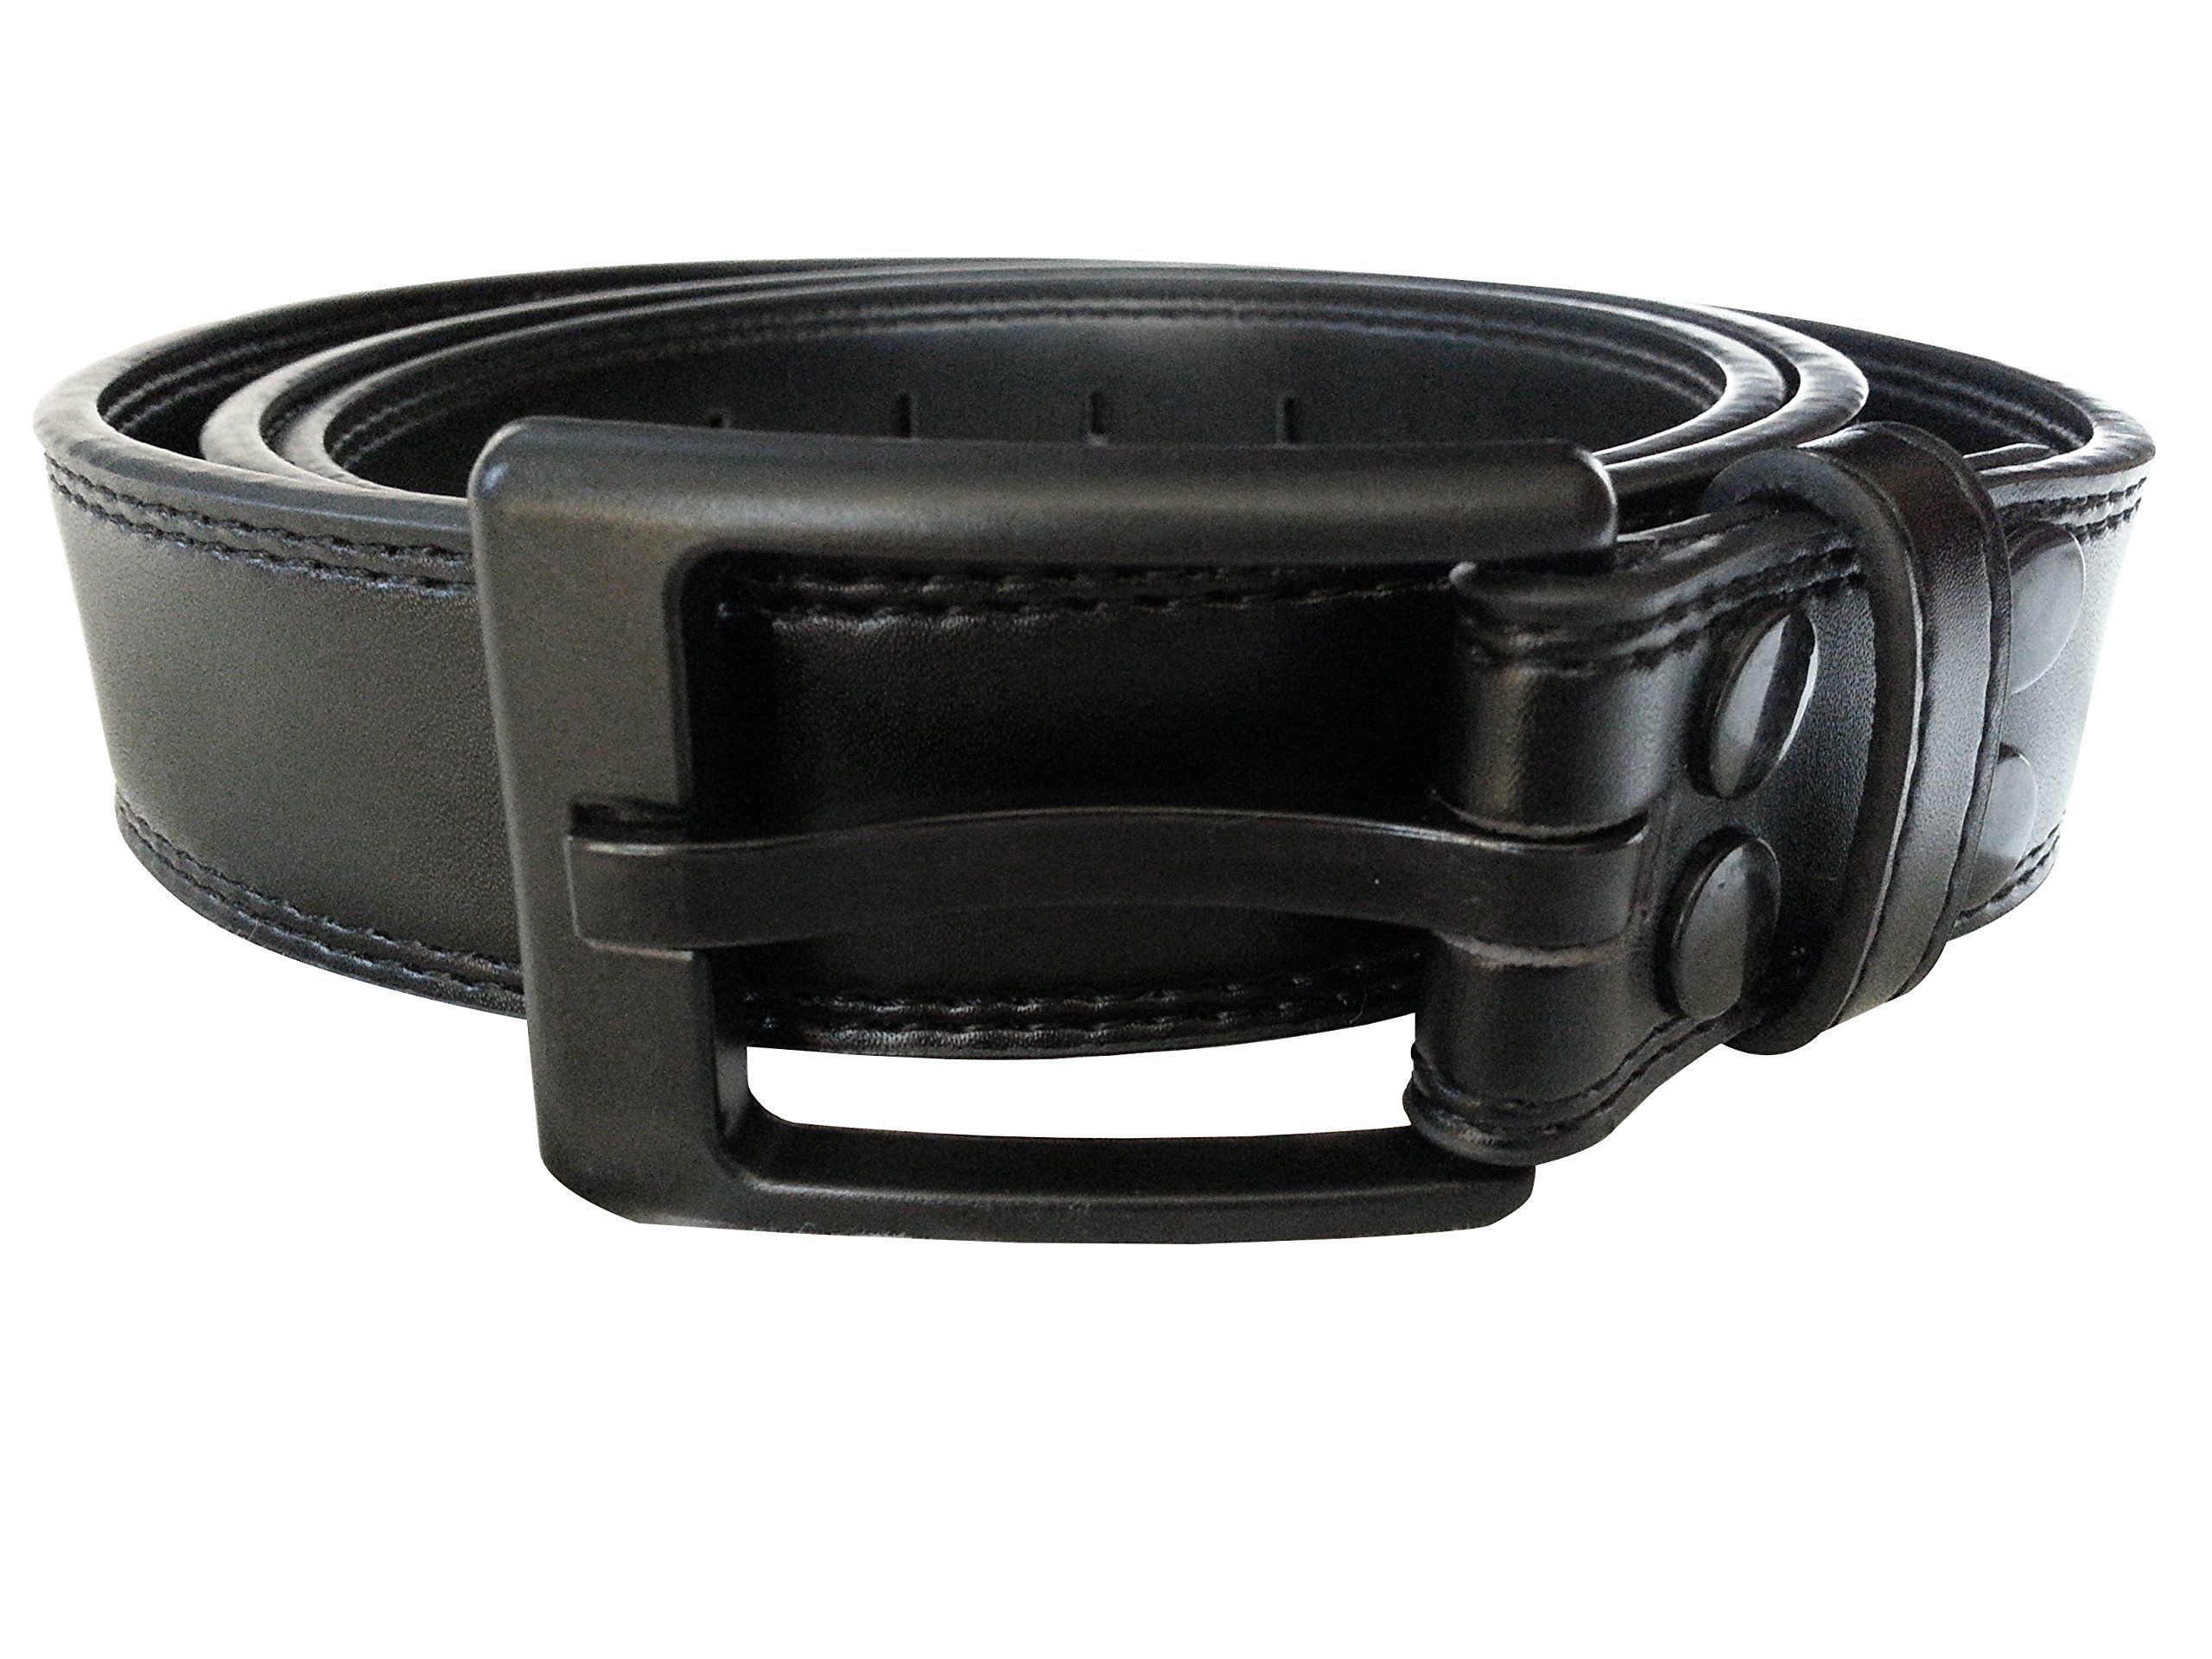 "Ferrer Men's MetalFree Belt 30"" 36"" Black Leather men"